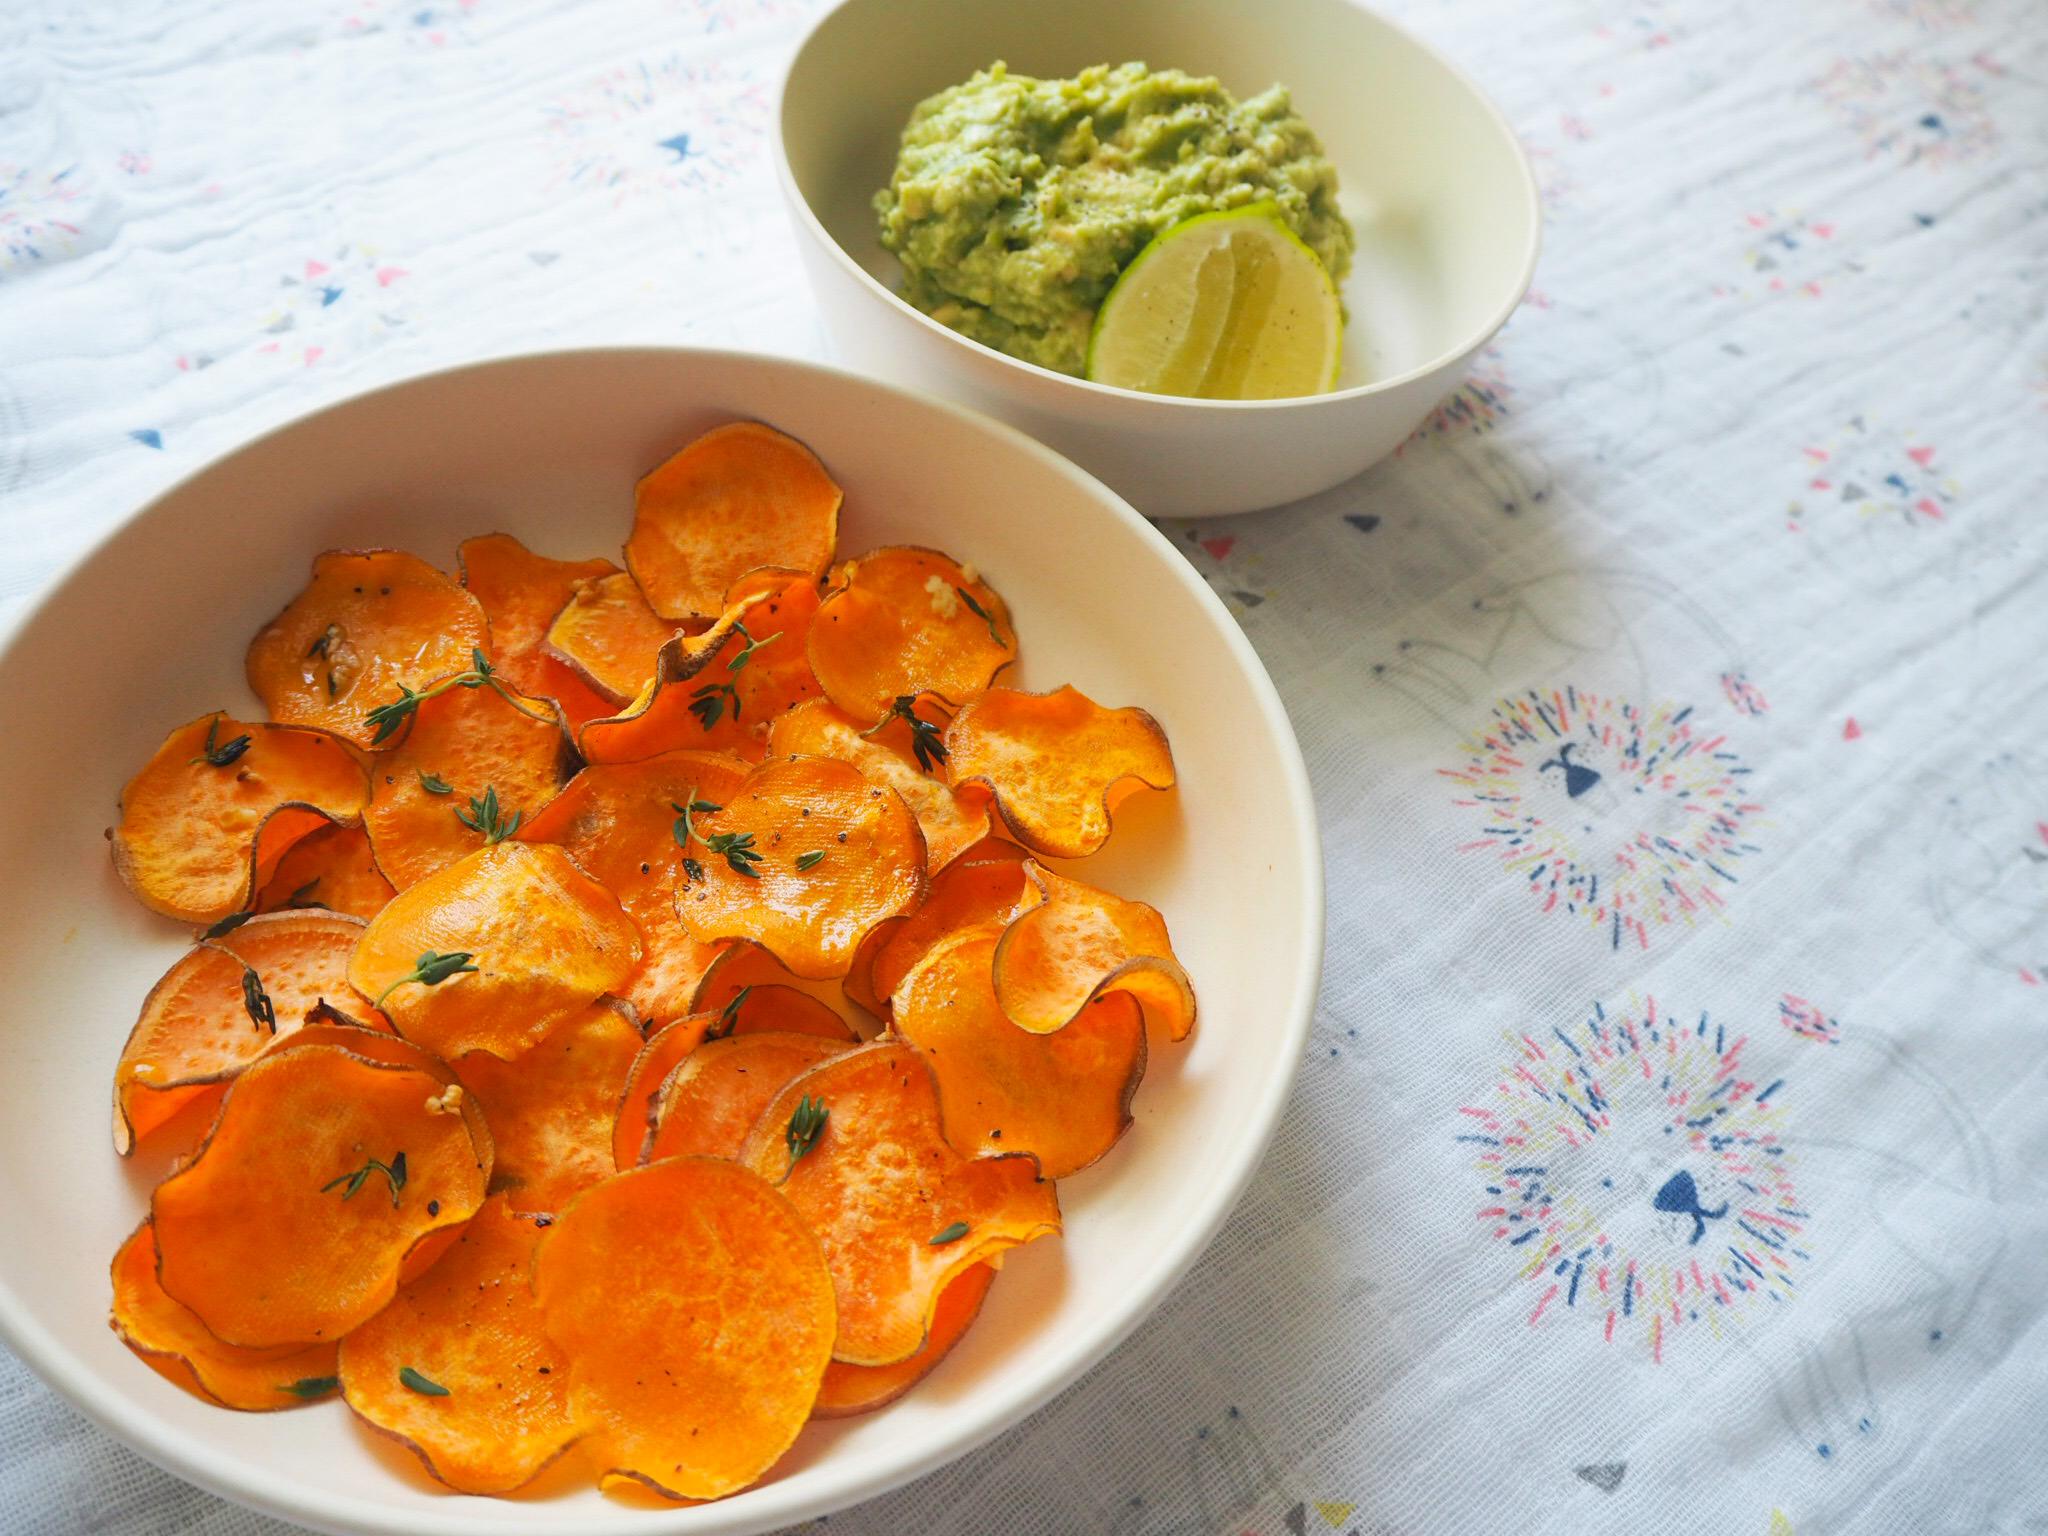 sweetpotatocrispsandguaclionmuslin.jpg